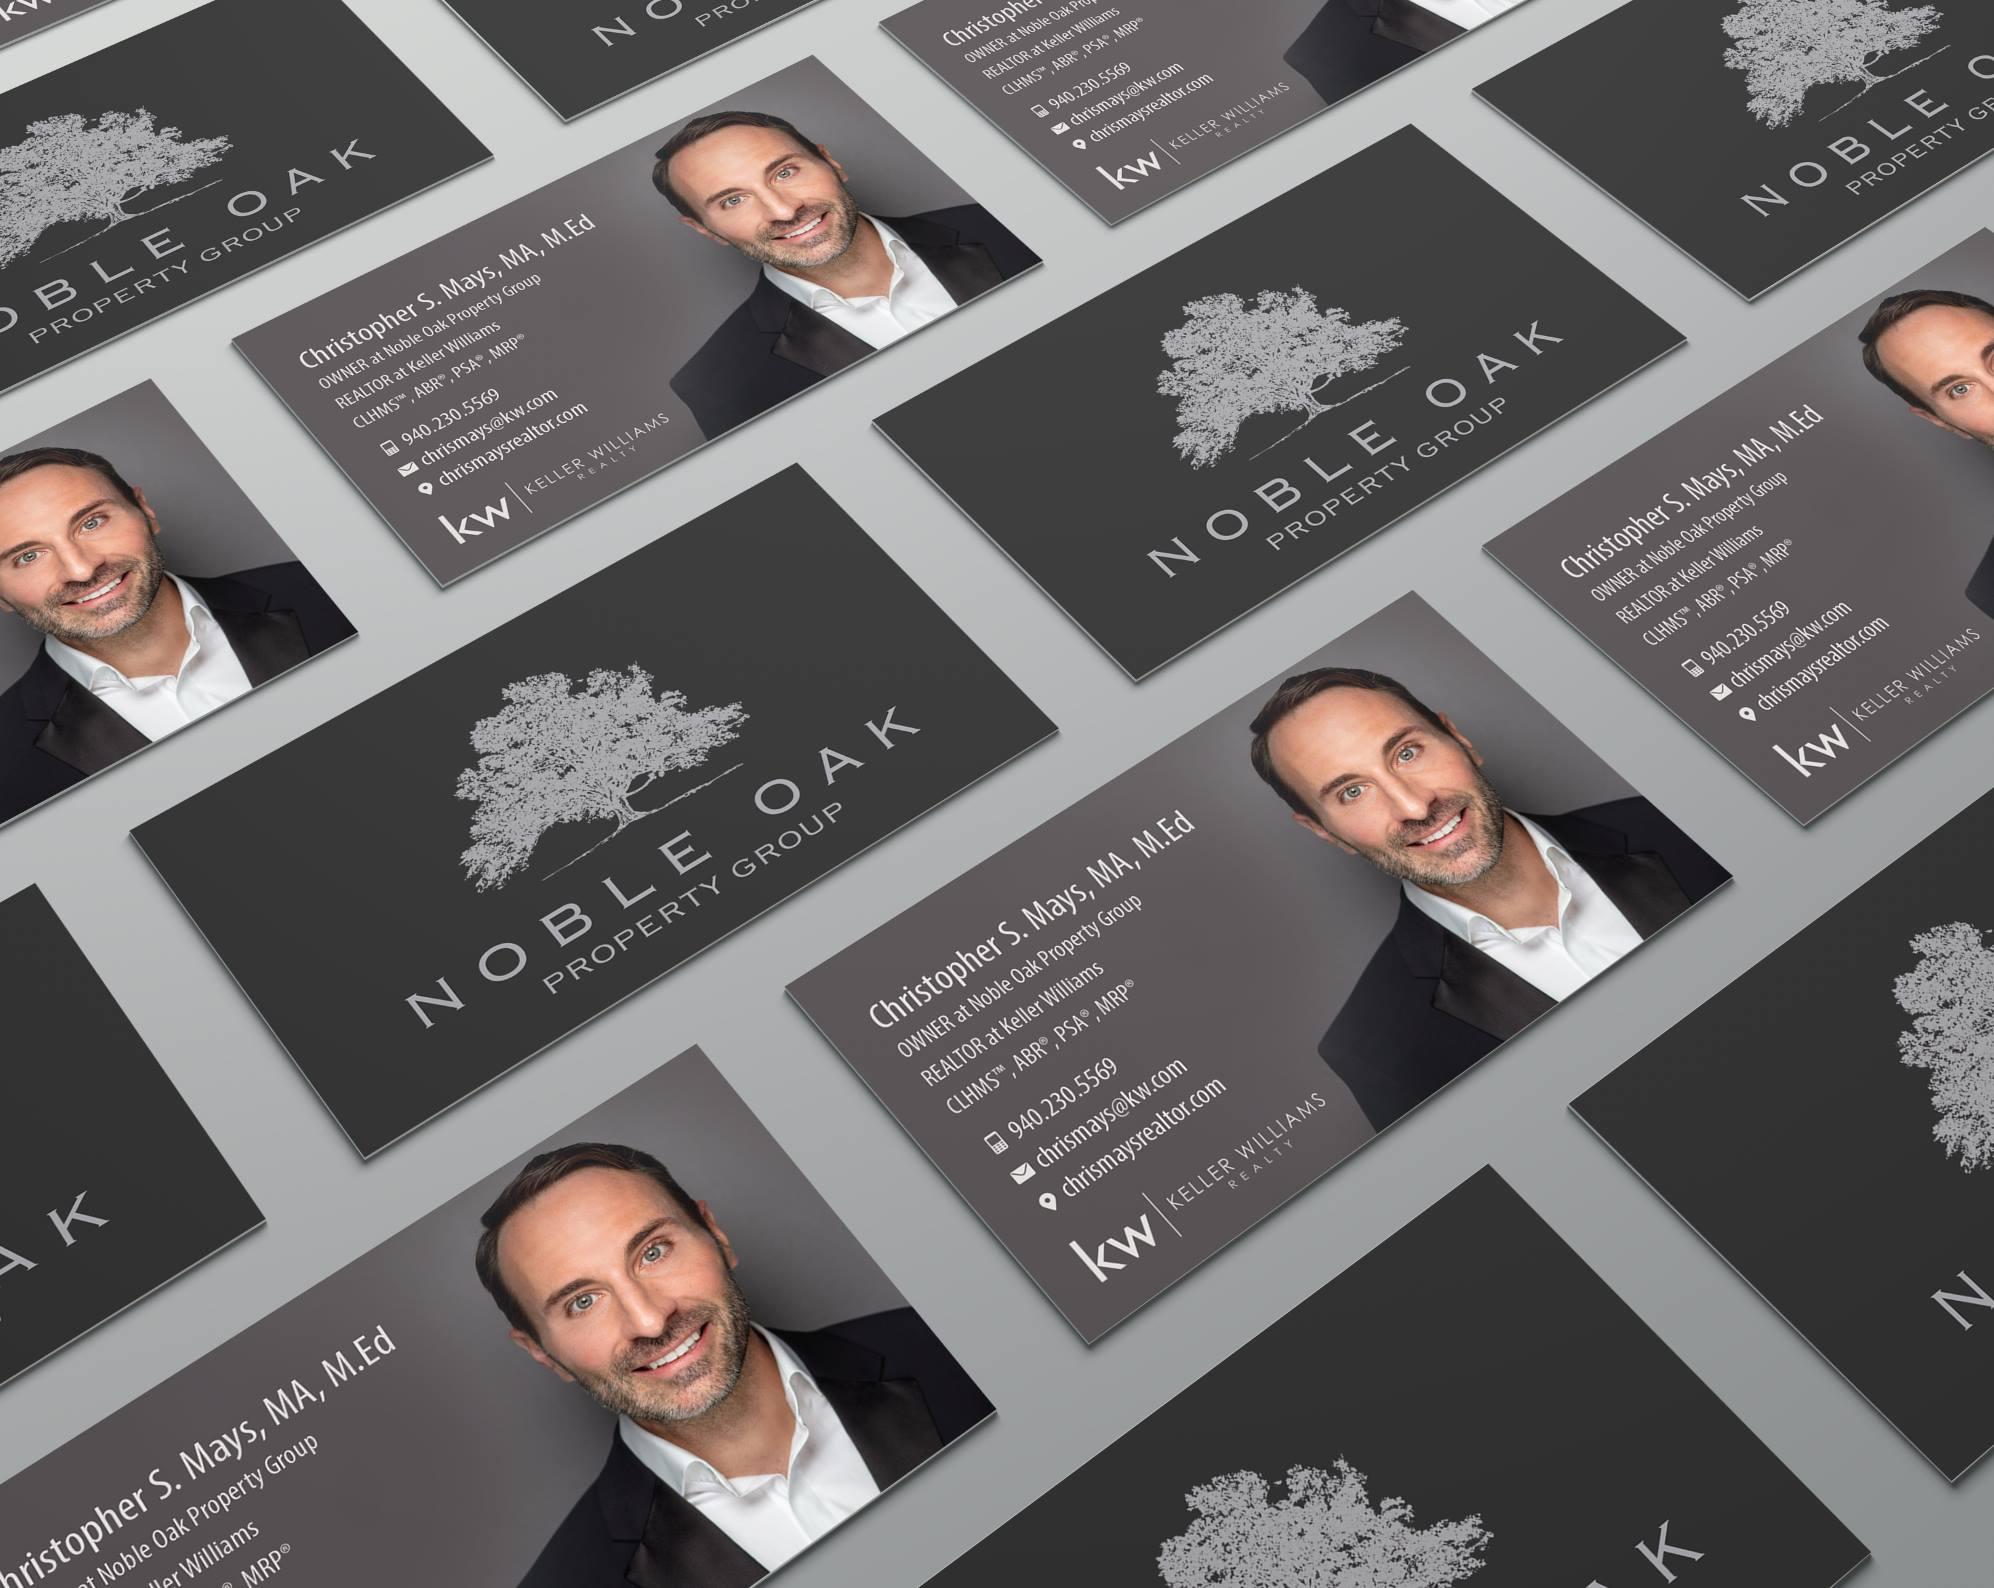 Chris Mays Realtor Business Card Mockup Noble Oak Property Group Business Card Design